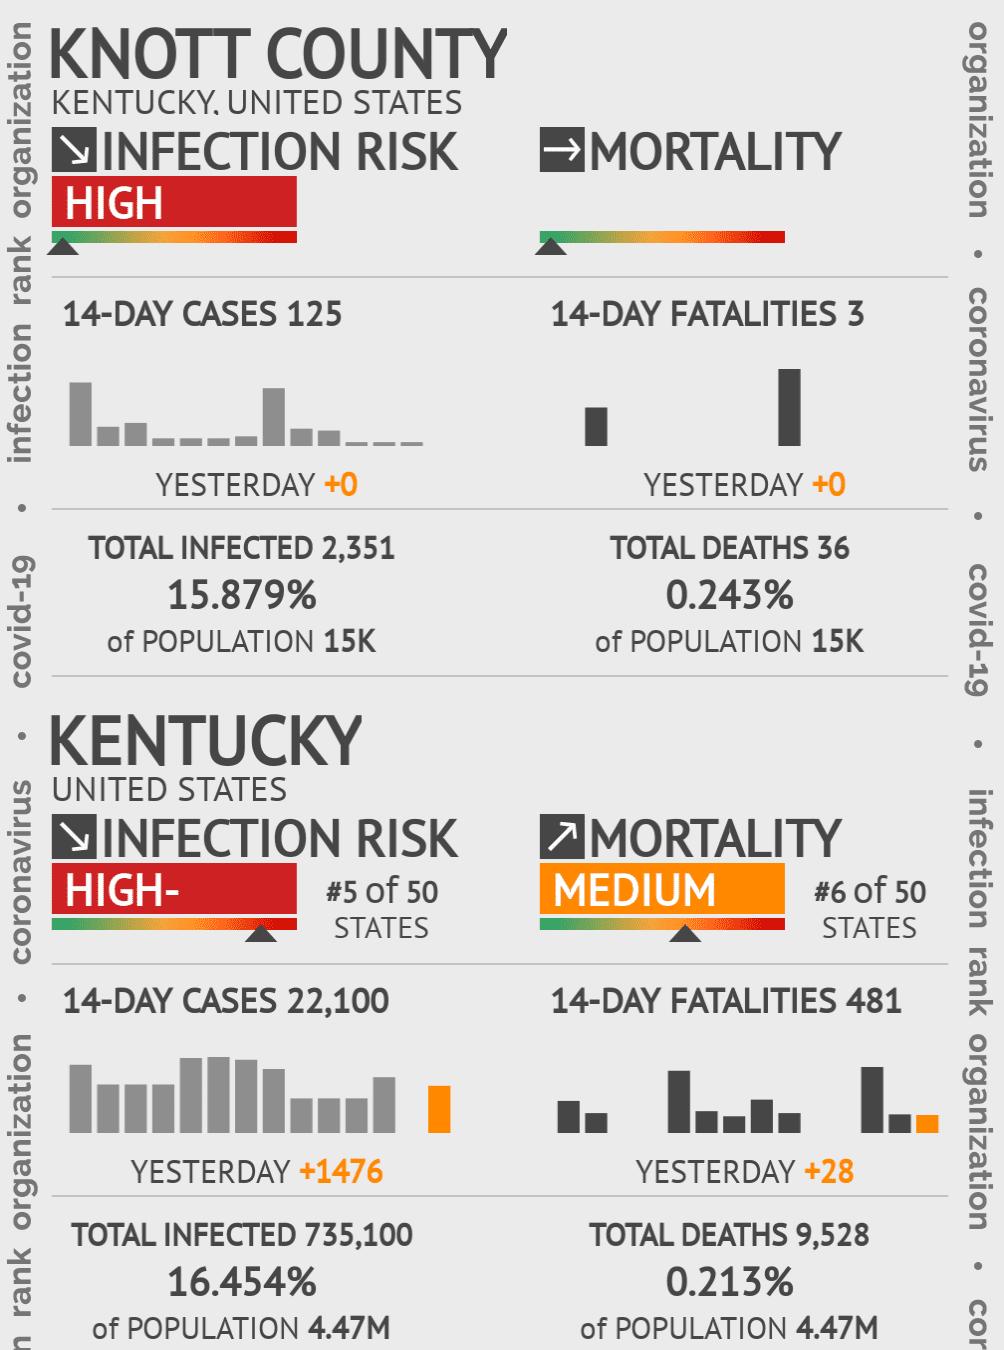 Knott County Coronavirus Covid-19 Risk of Infection on July 24, 2021